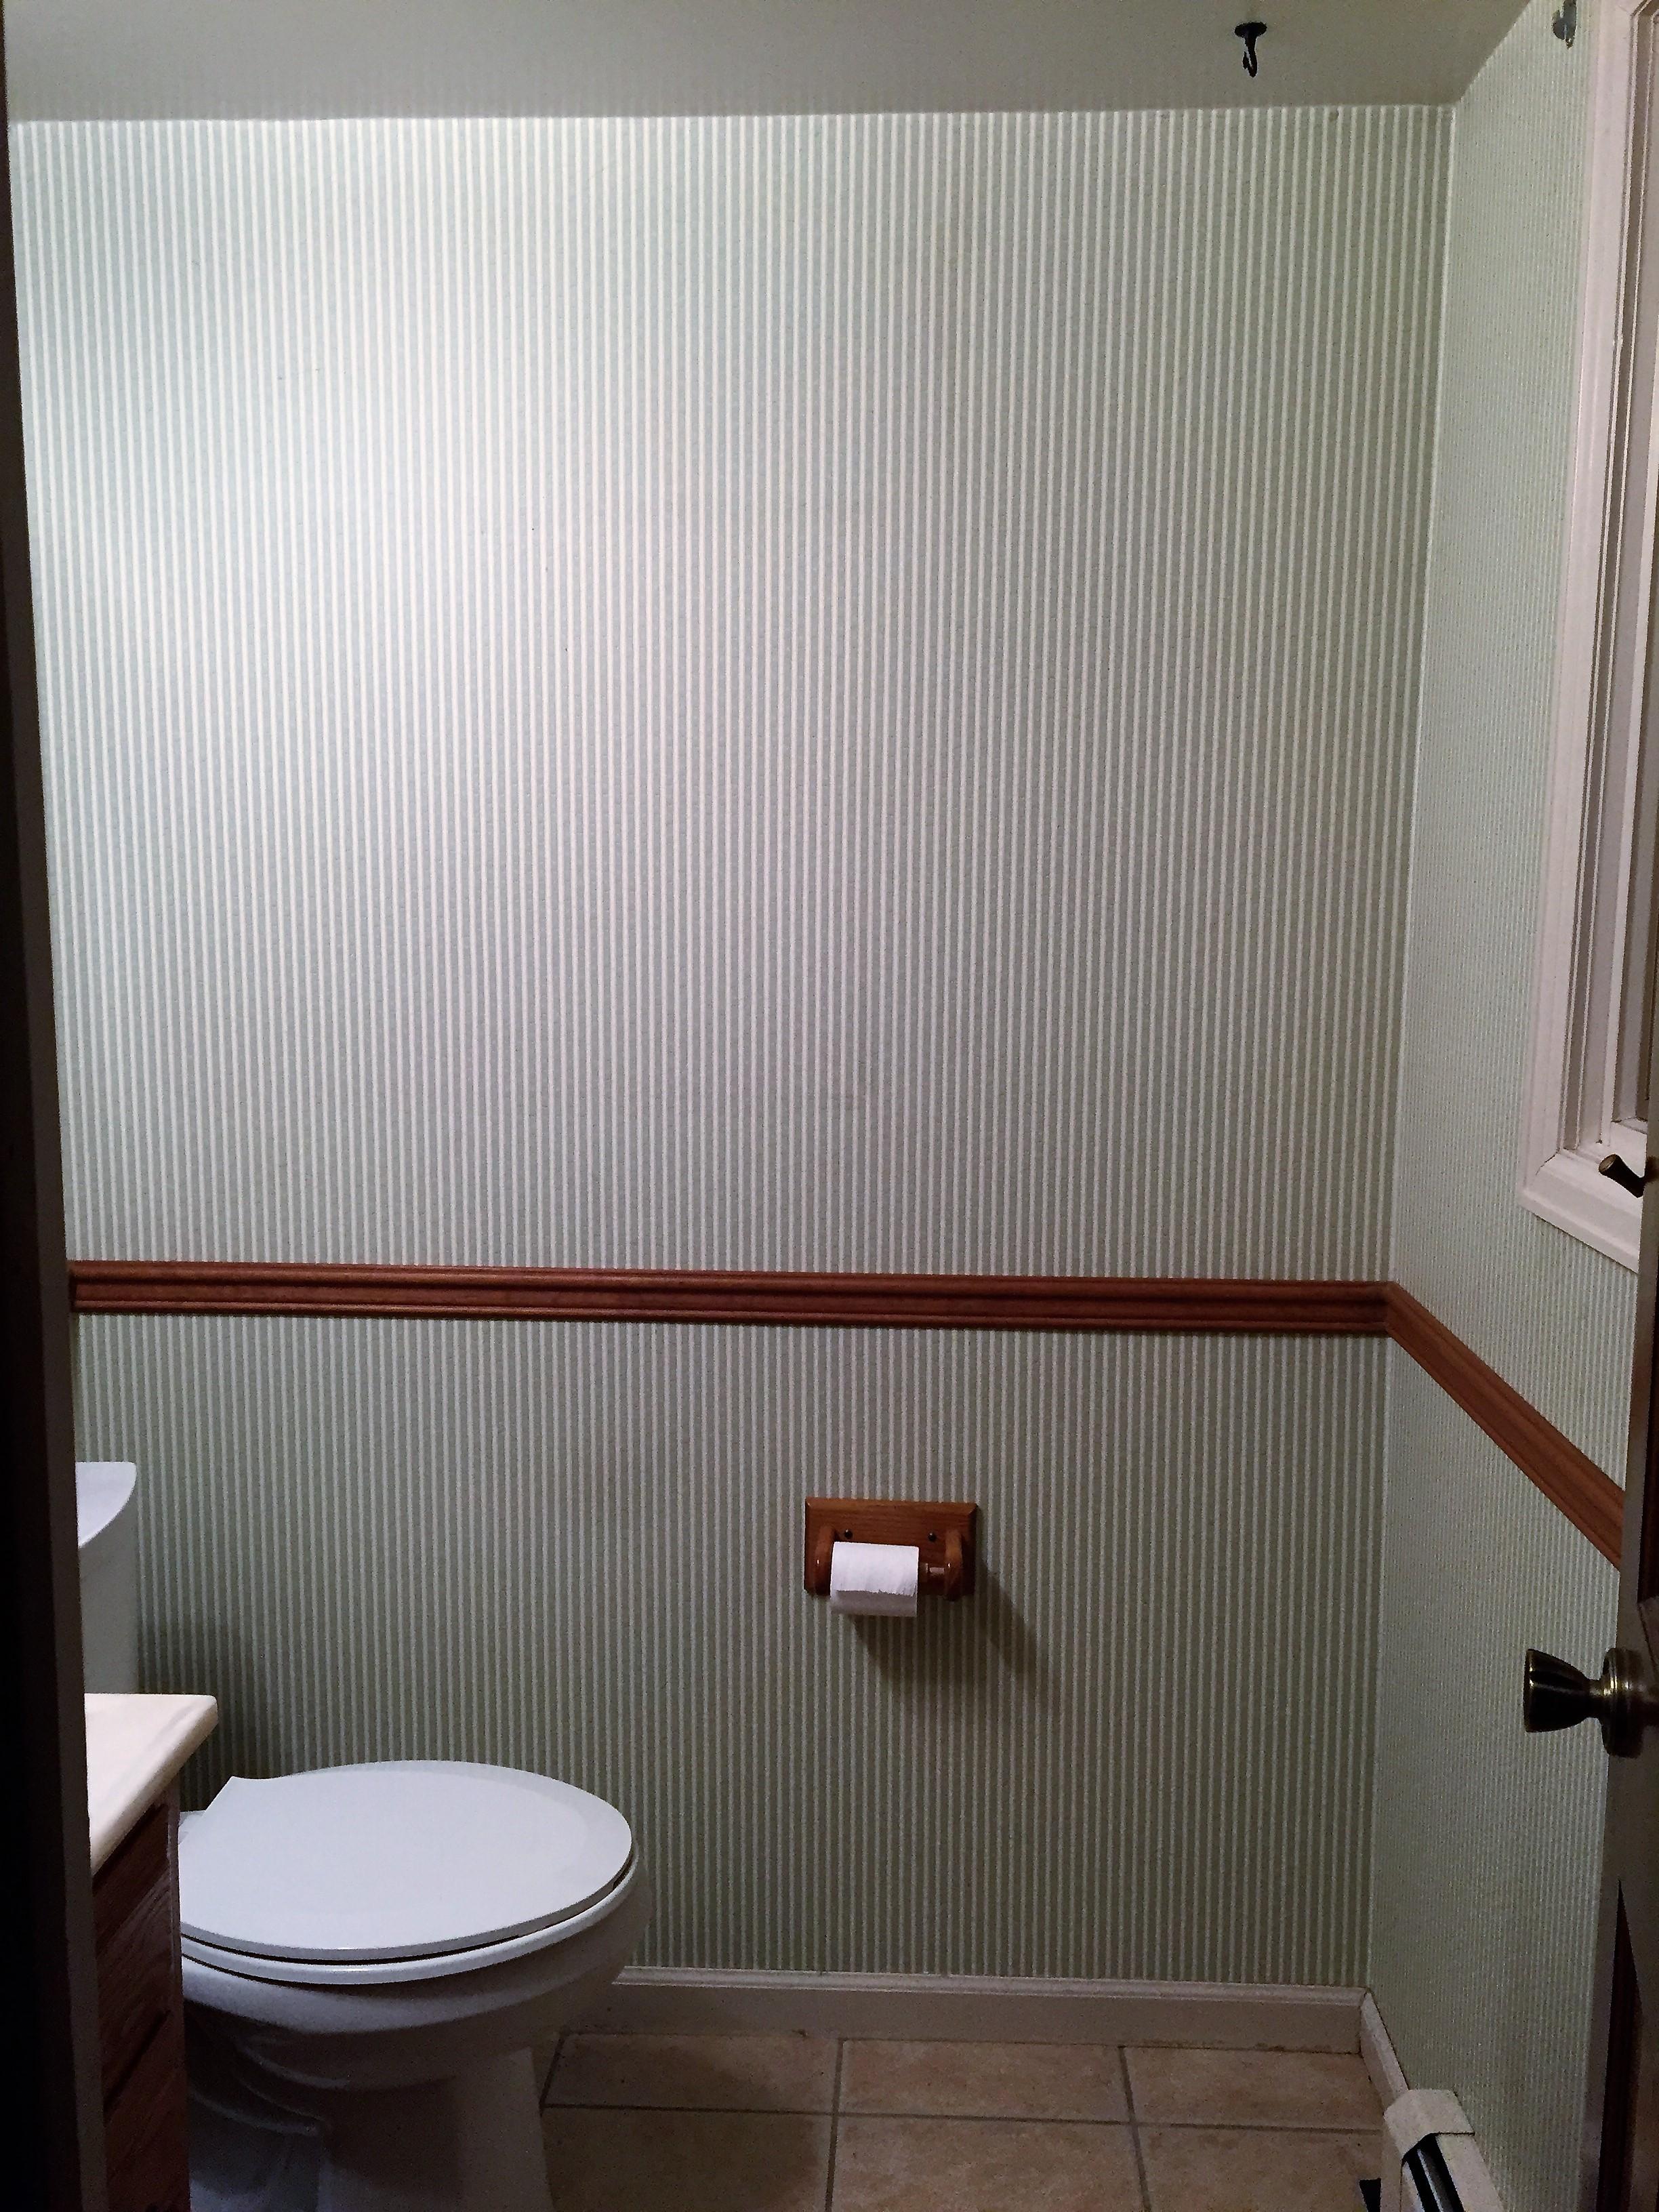 Before image of the half bathroom